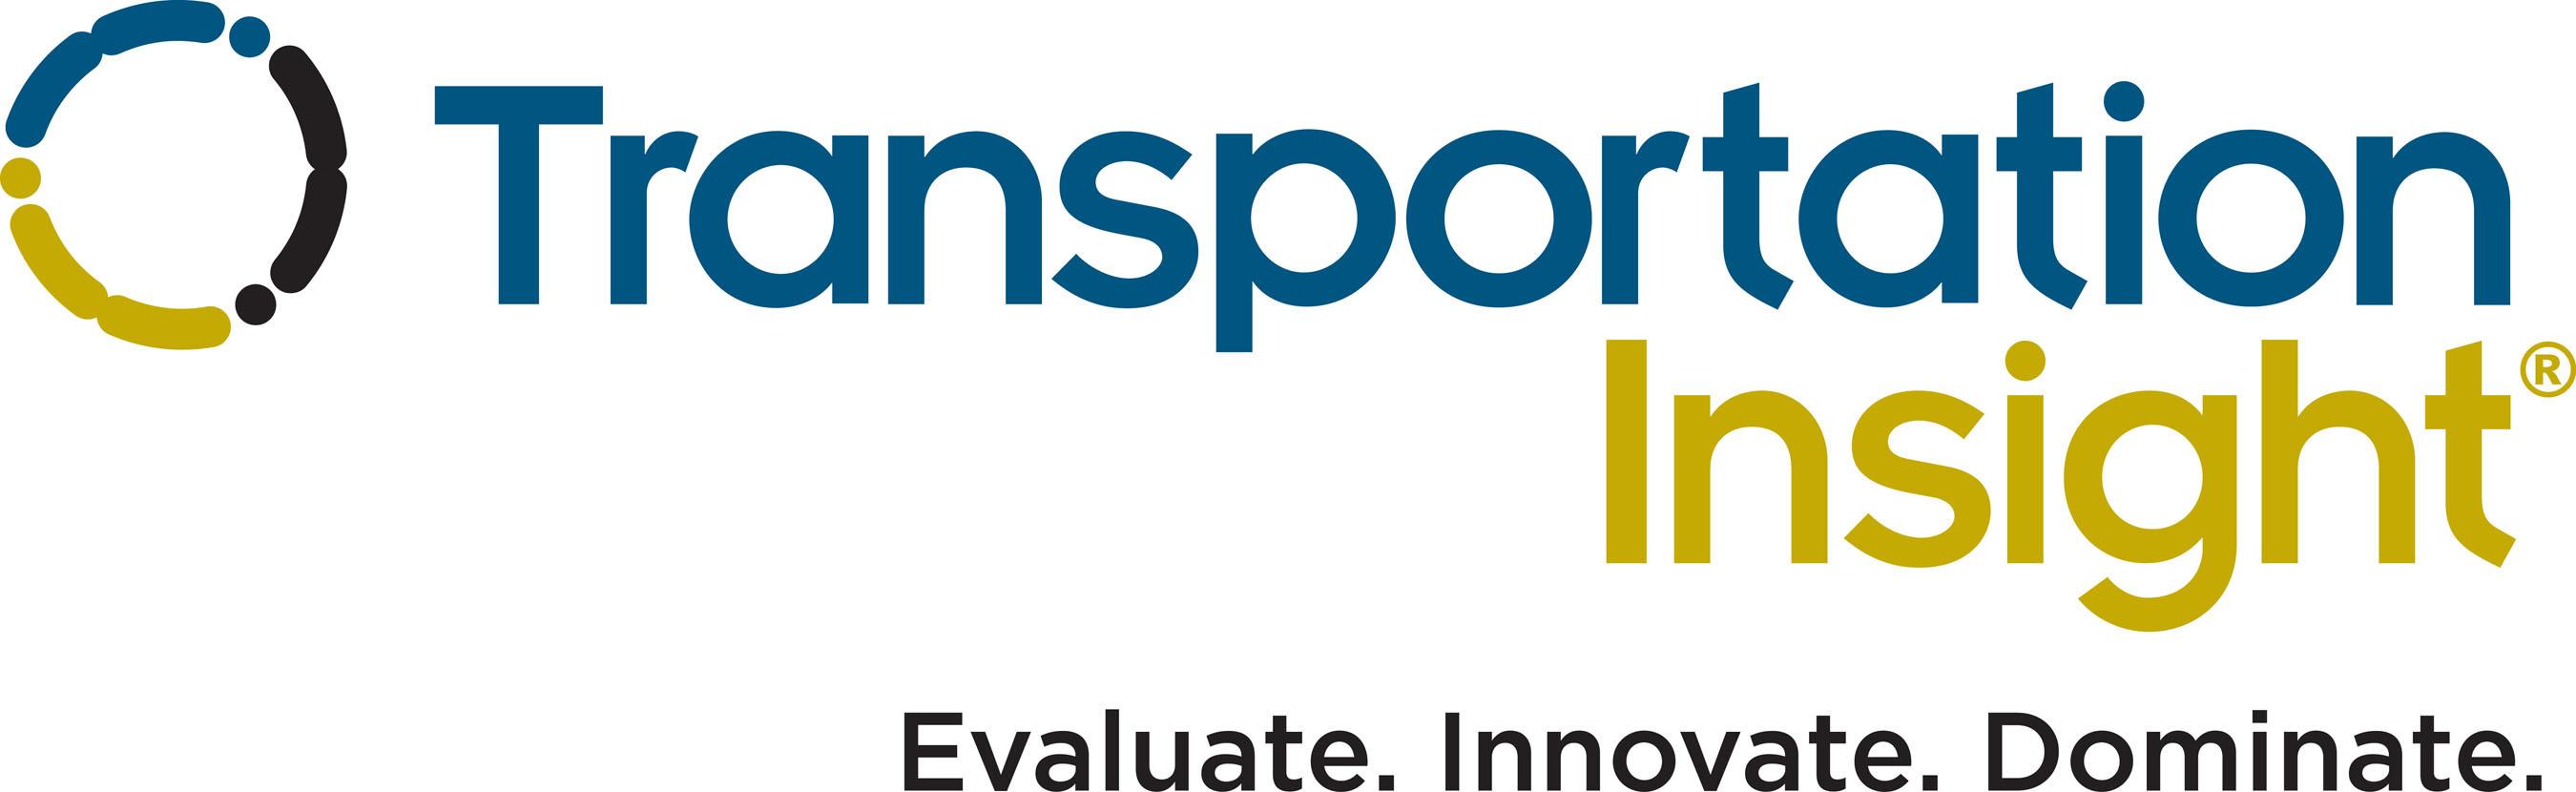 Transportation Insight: Evaluate. Innovate. Dominate.